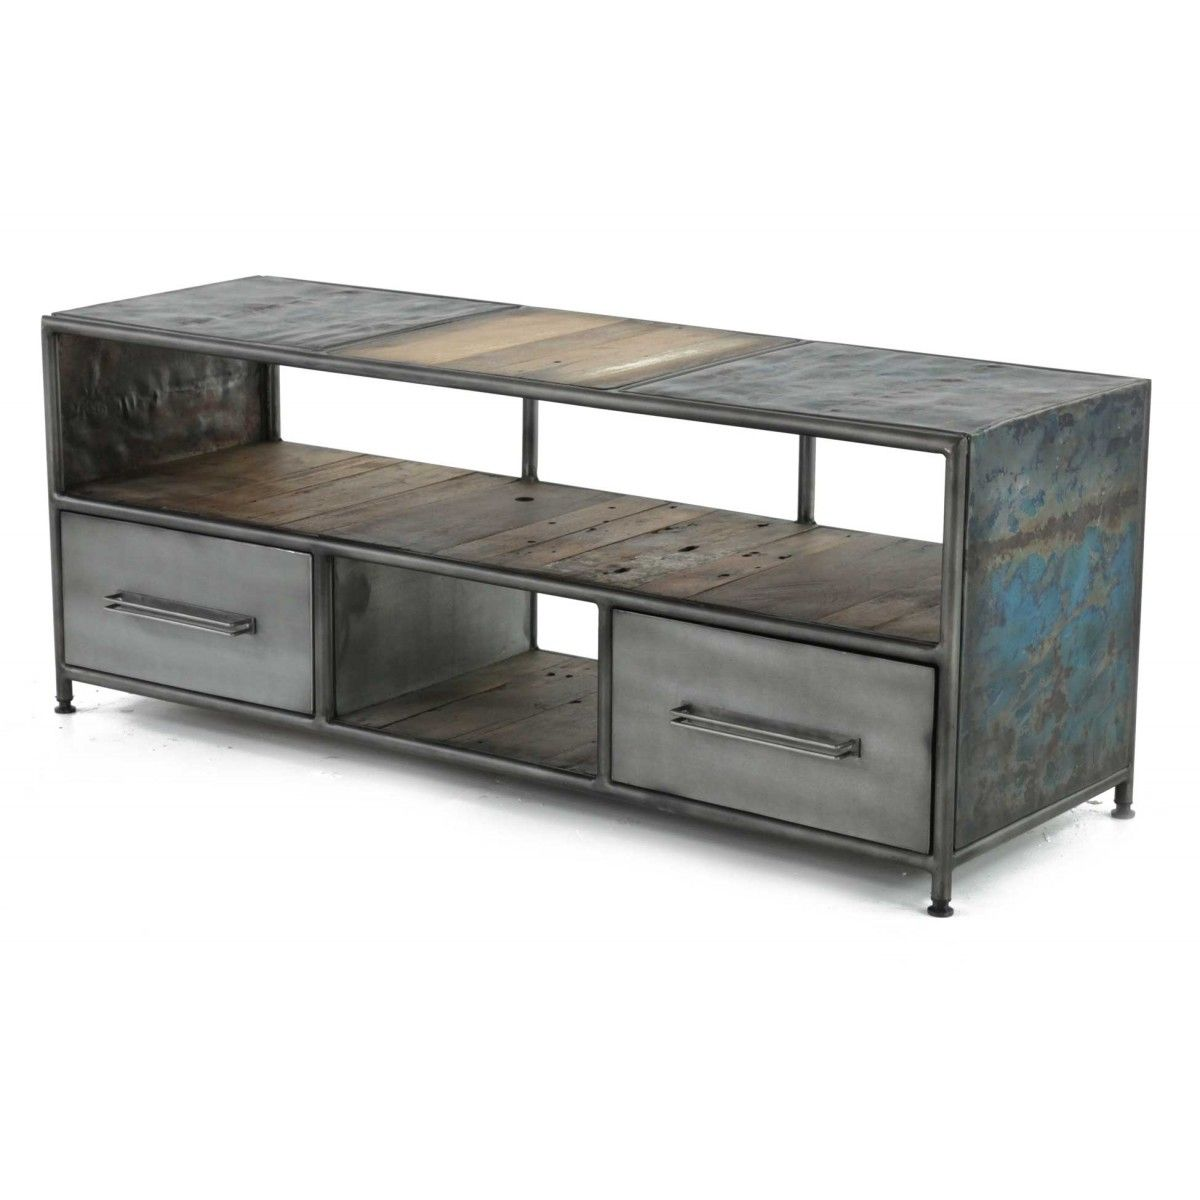 579 meuble tv teck 140 x 45 cm 2 tiroirs 2 niches klo - Meuble Tv Bas Teck